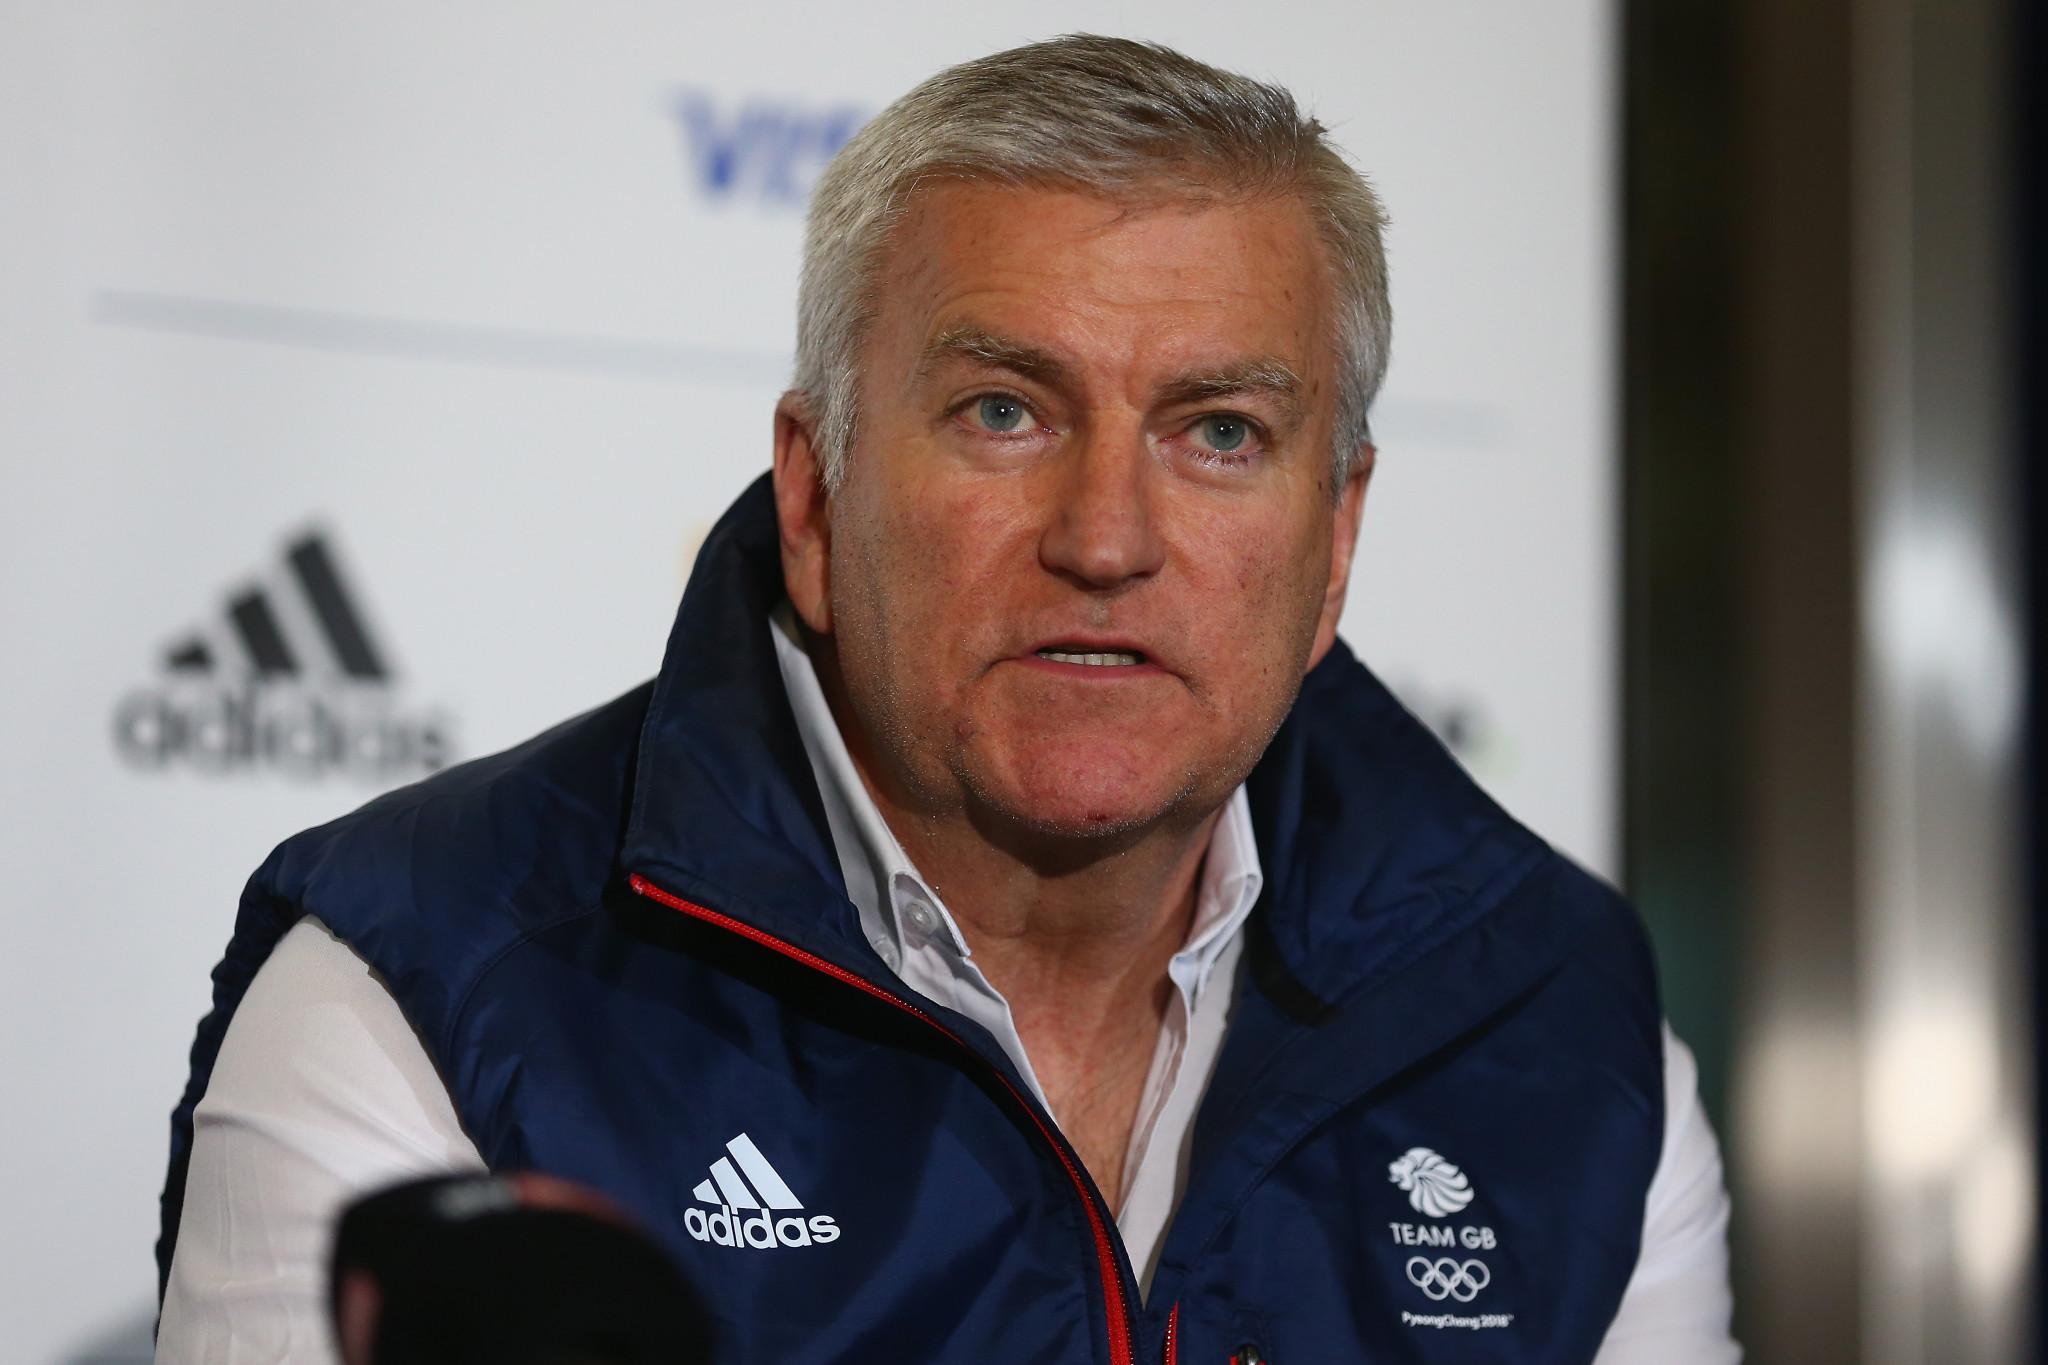 British Olympic Association chief executive Sweeney leaving for RFU